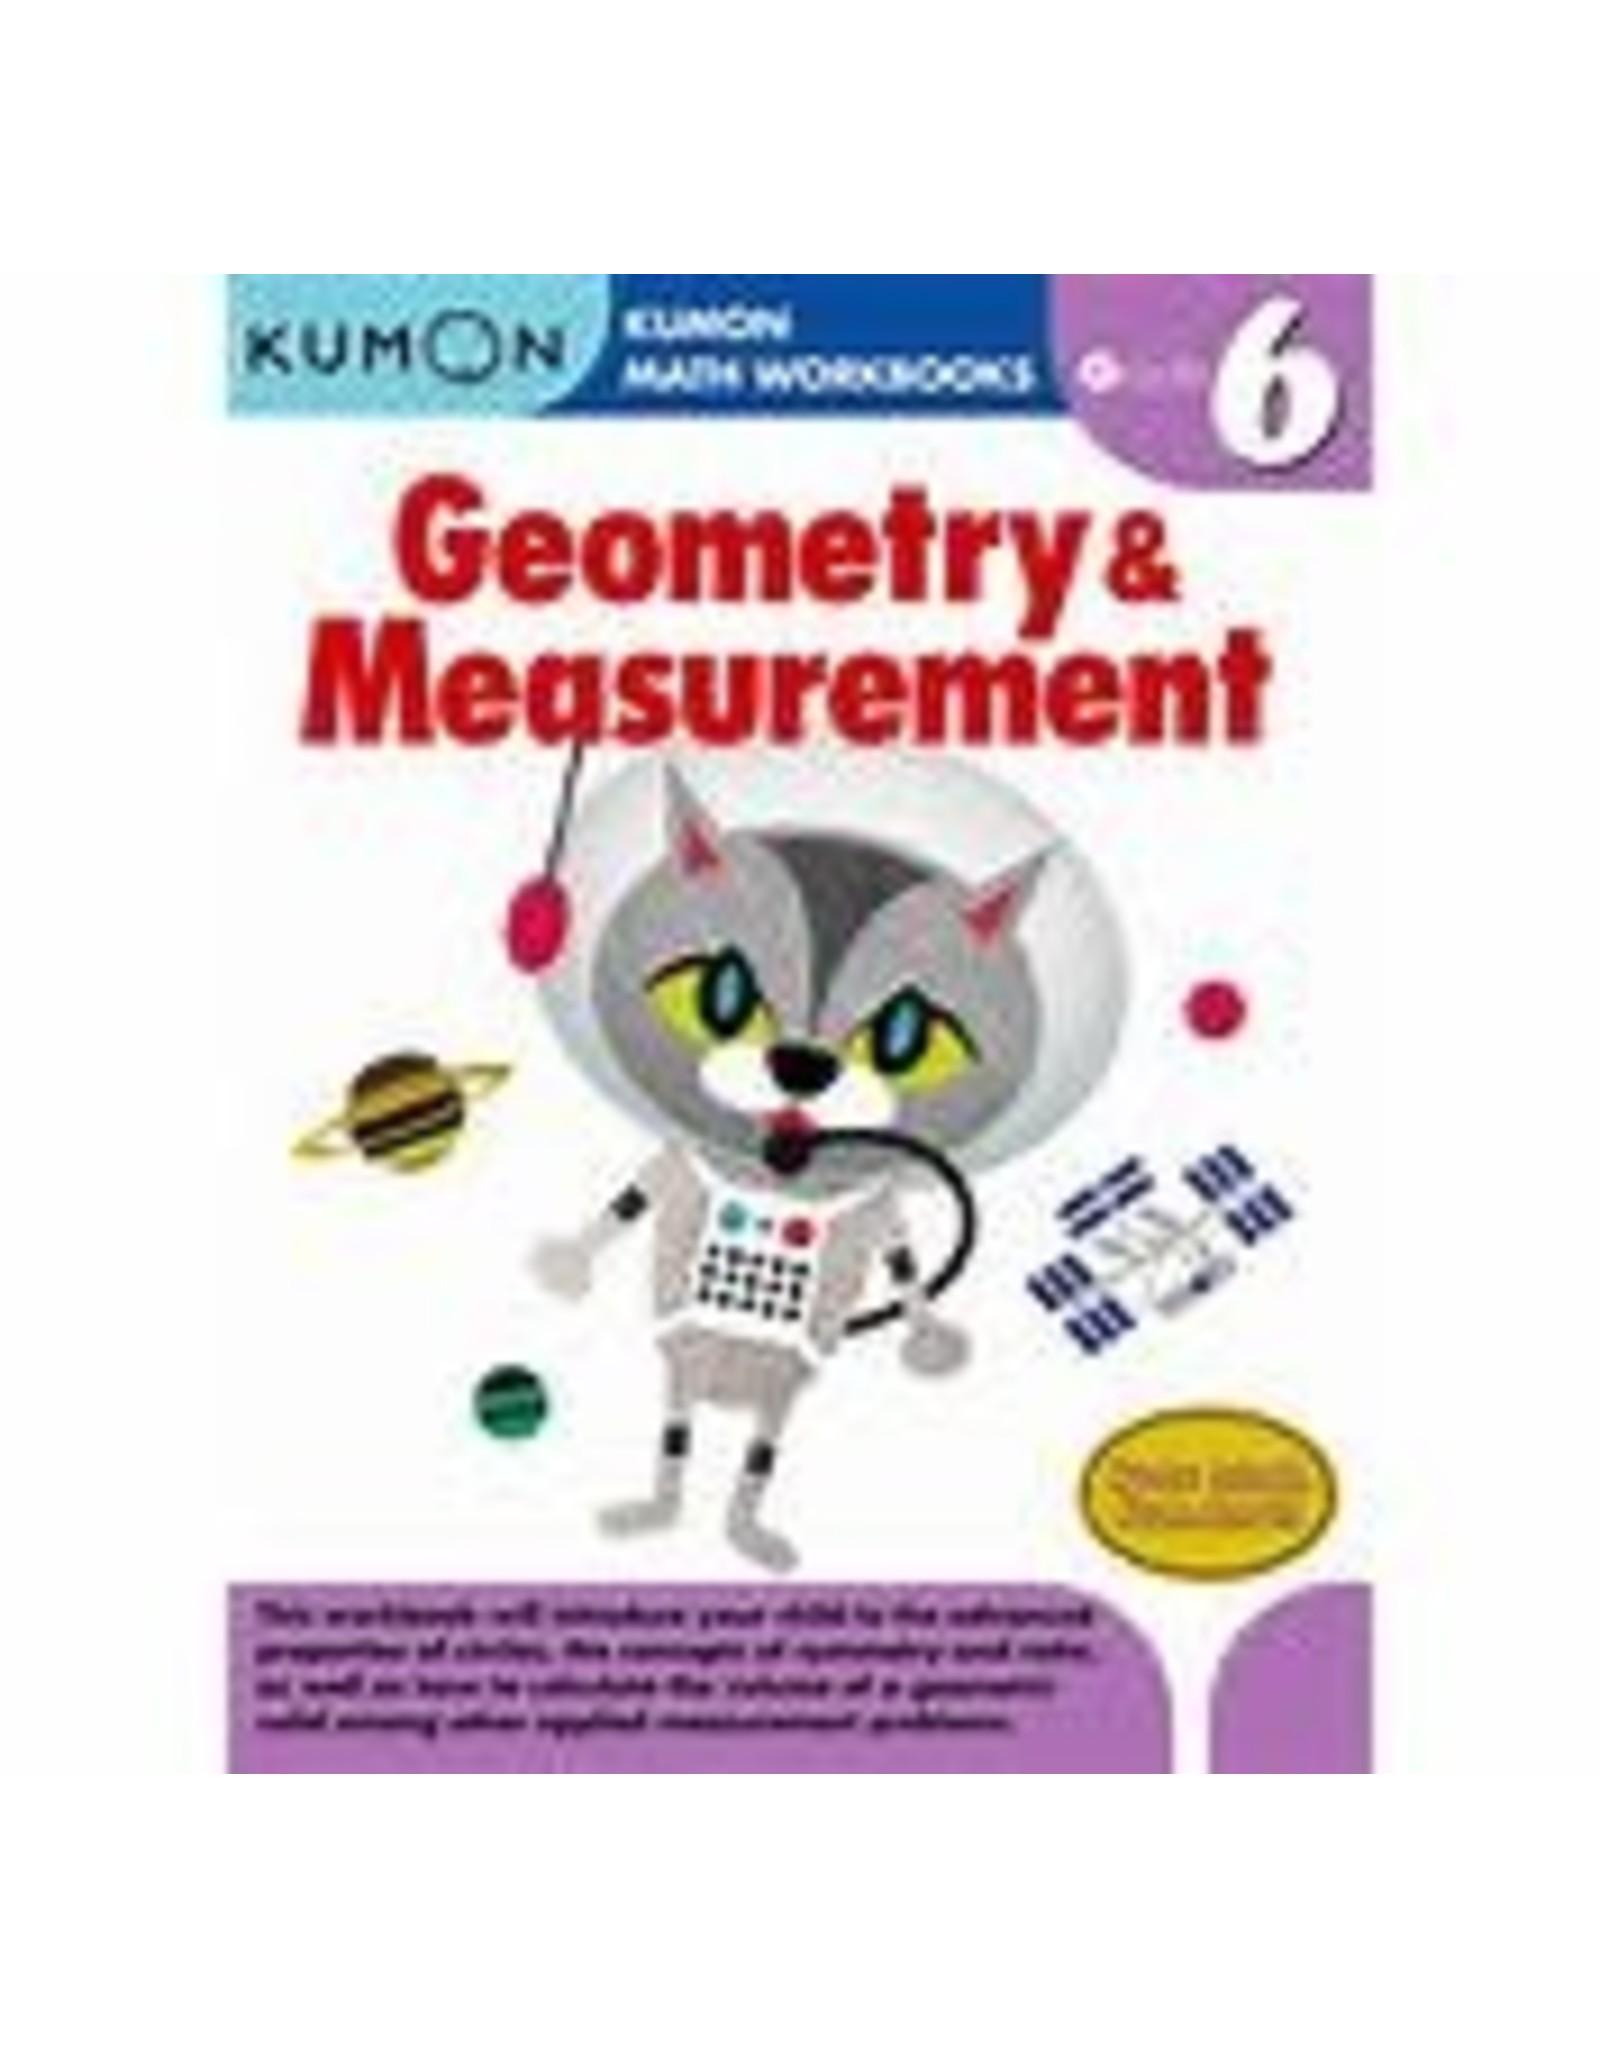 Kumon GRADE 6 GEOMETRY & MEASUREMENT